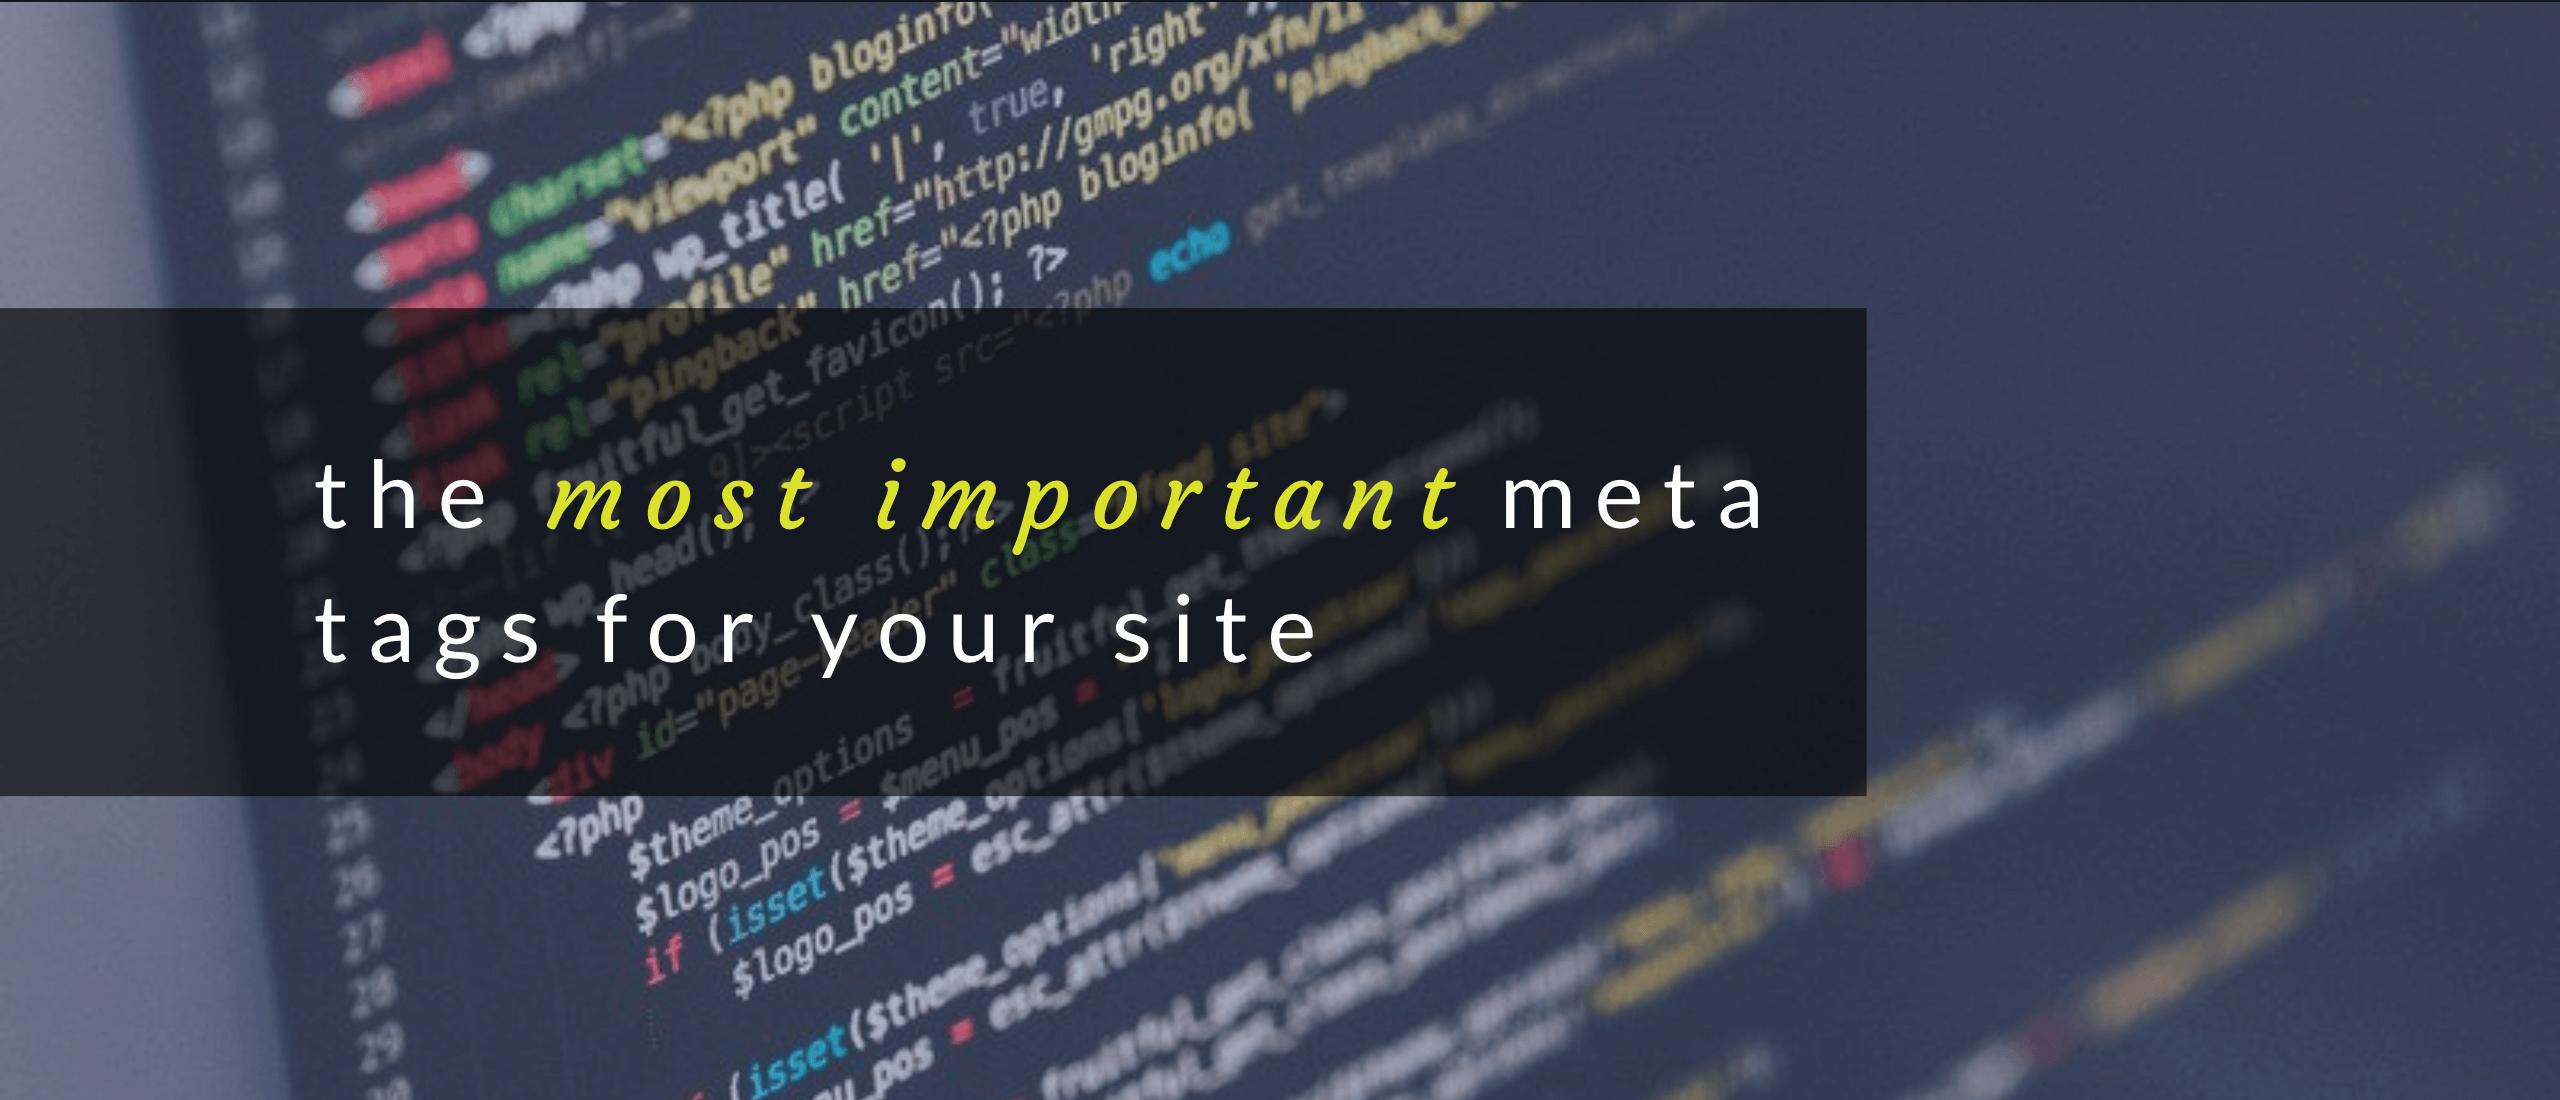 Header image of SEO meta tags article.